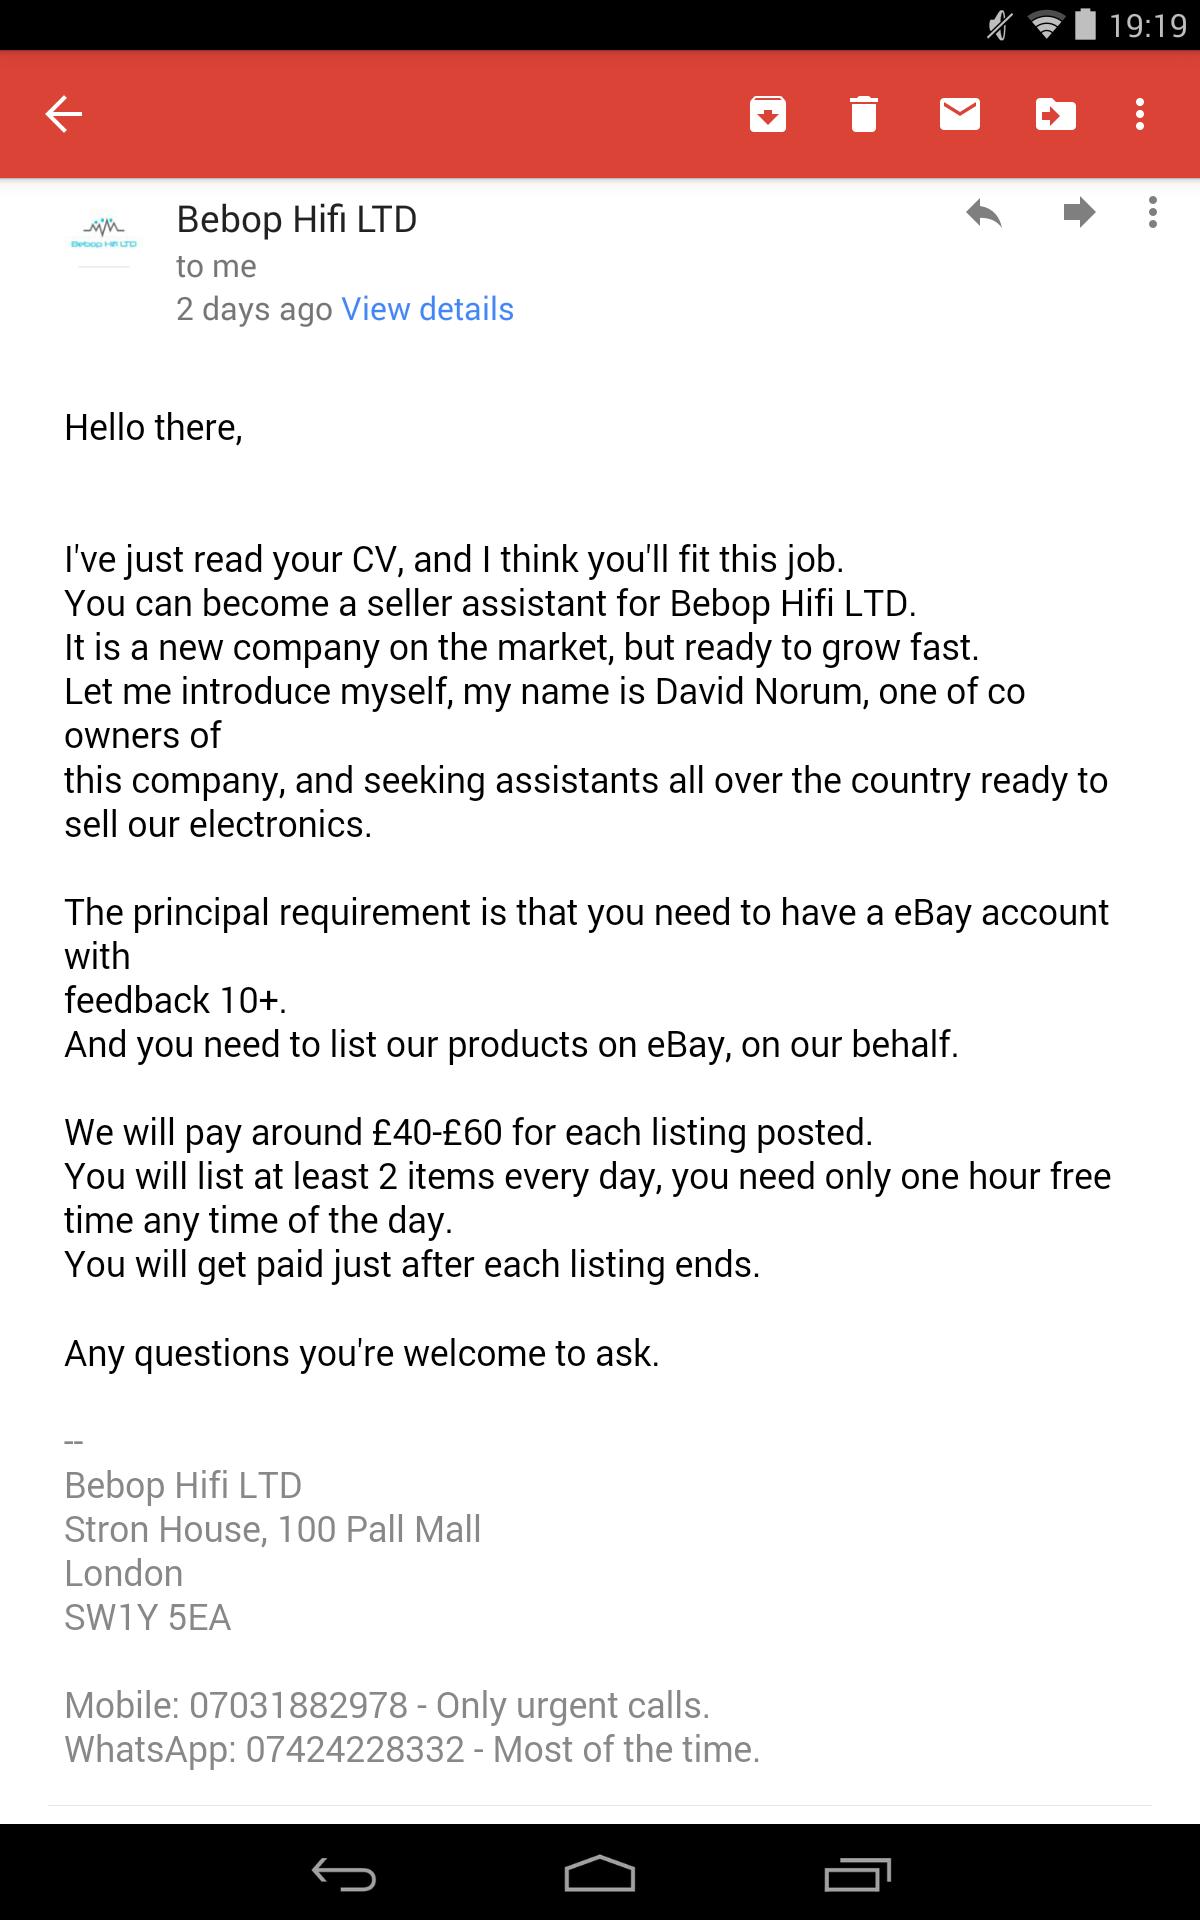 Bebop Hifi LTD scam? - The eBay Community